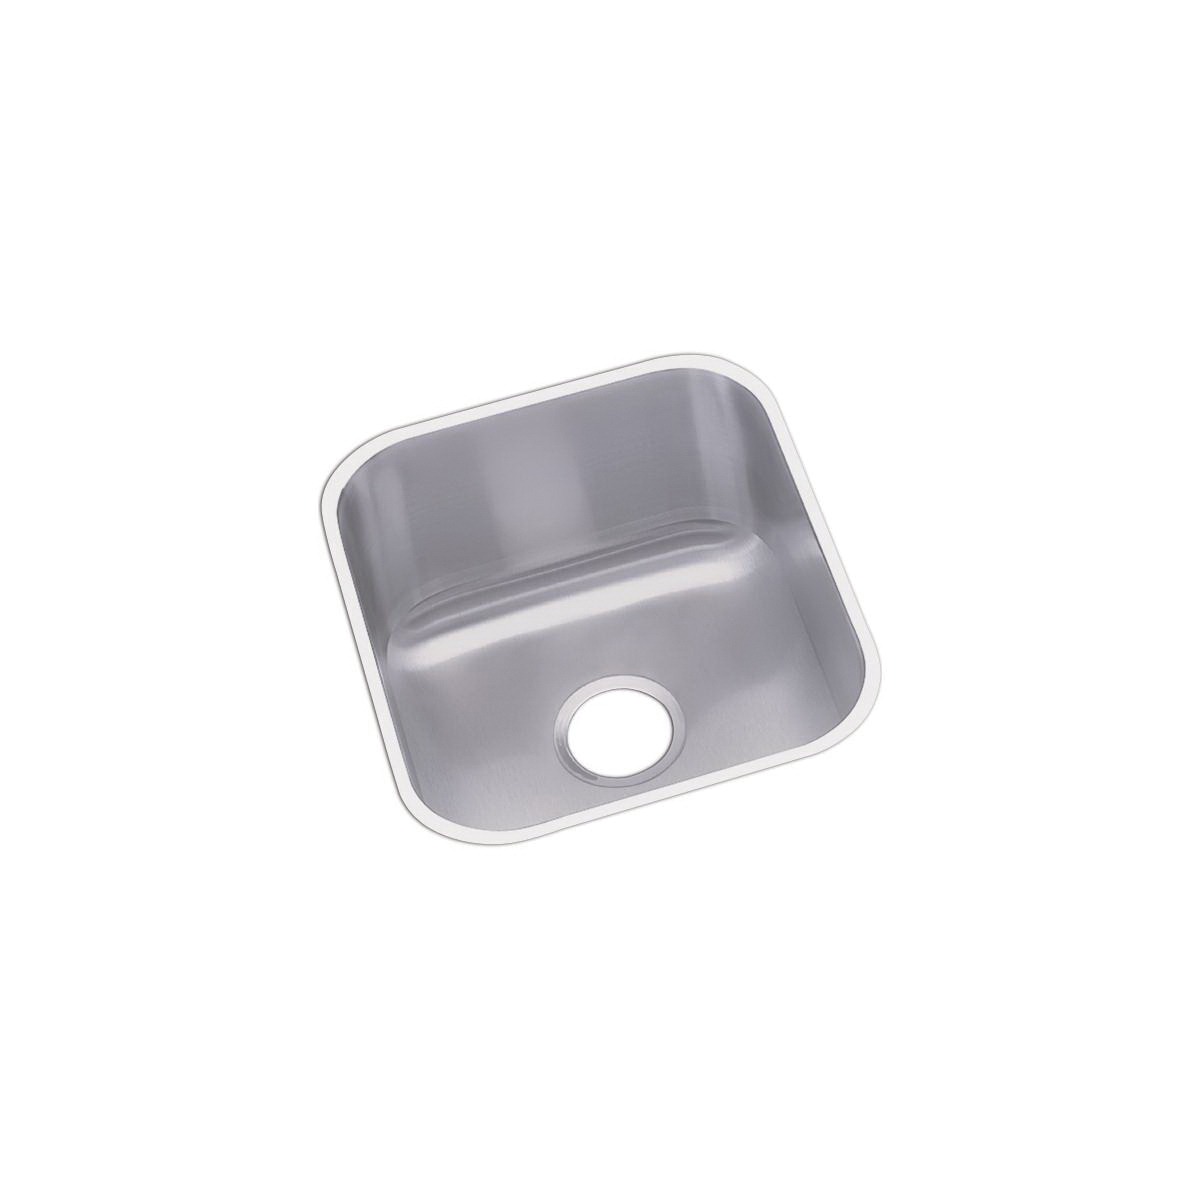 Elkay® DXUH1618 Dayton® Bar Sink, Round, 16-1/2 in W x 18-1/4 in D x 8 in H, Under Mount, Stainless Steel, Radiant Satin, Domestic